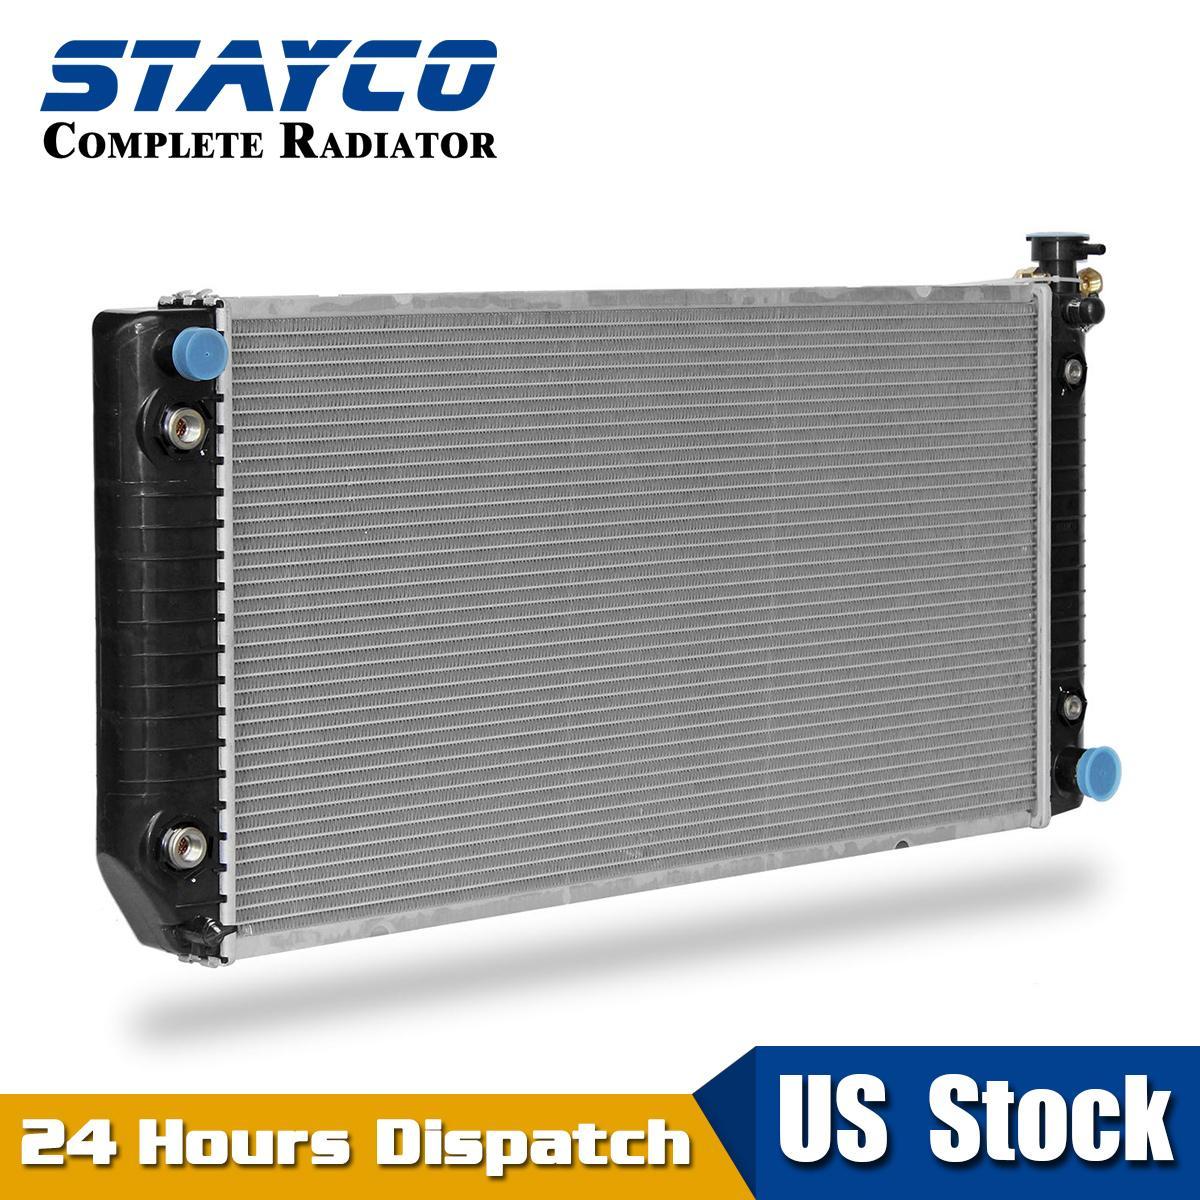 Radiator Support New for Chevy Chevrolet C1500 Truck K1500 GMC K2500 C3500 C2500